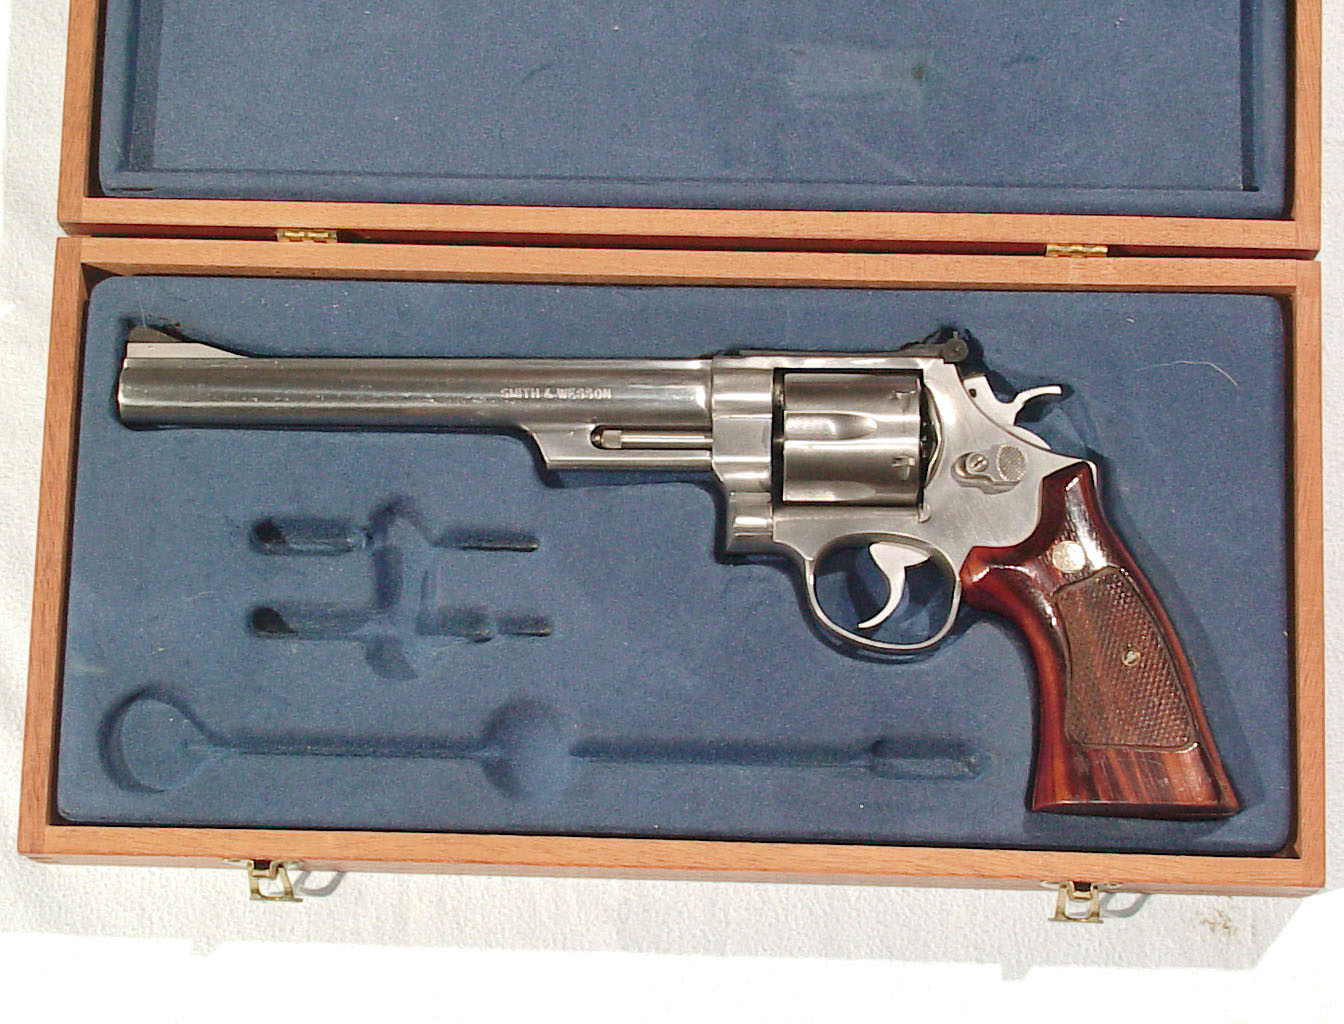 22 Magnum Revolver for Sale - Gun Broker